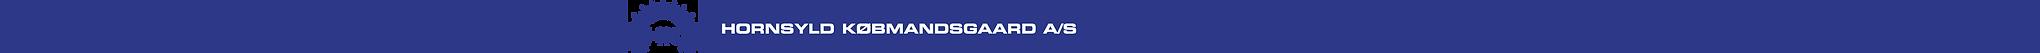 Hornsyld købmandsgård_en linie_logo_web.